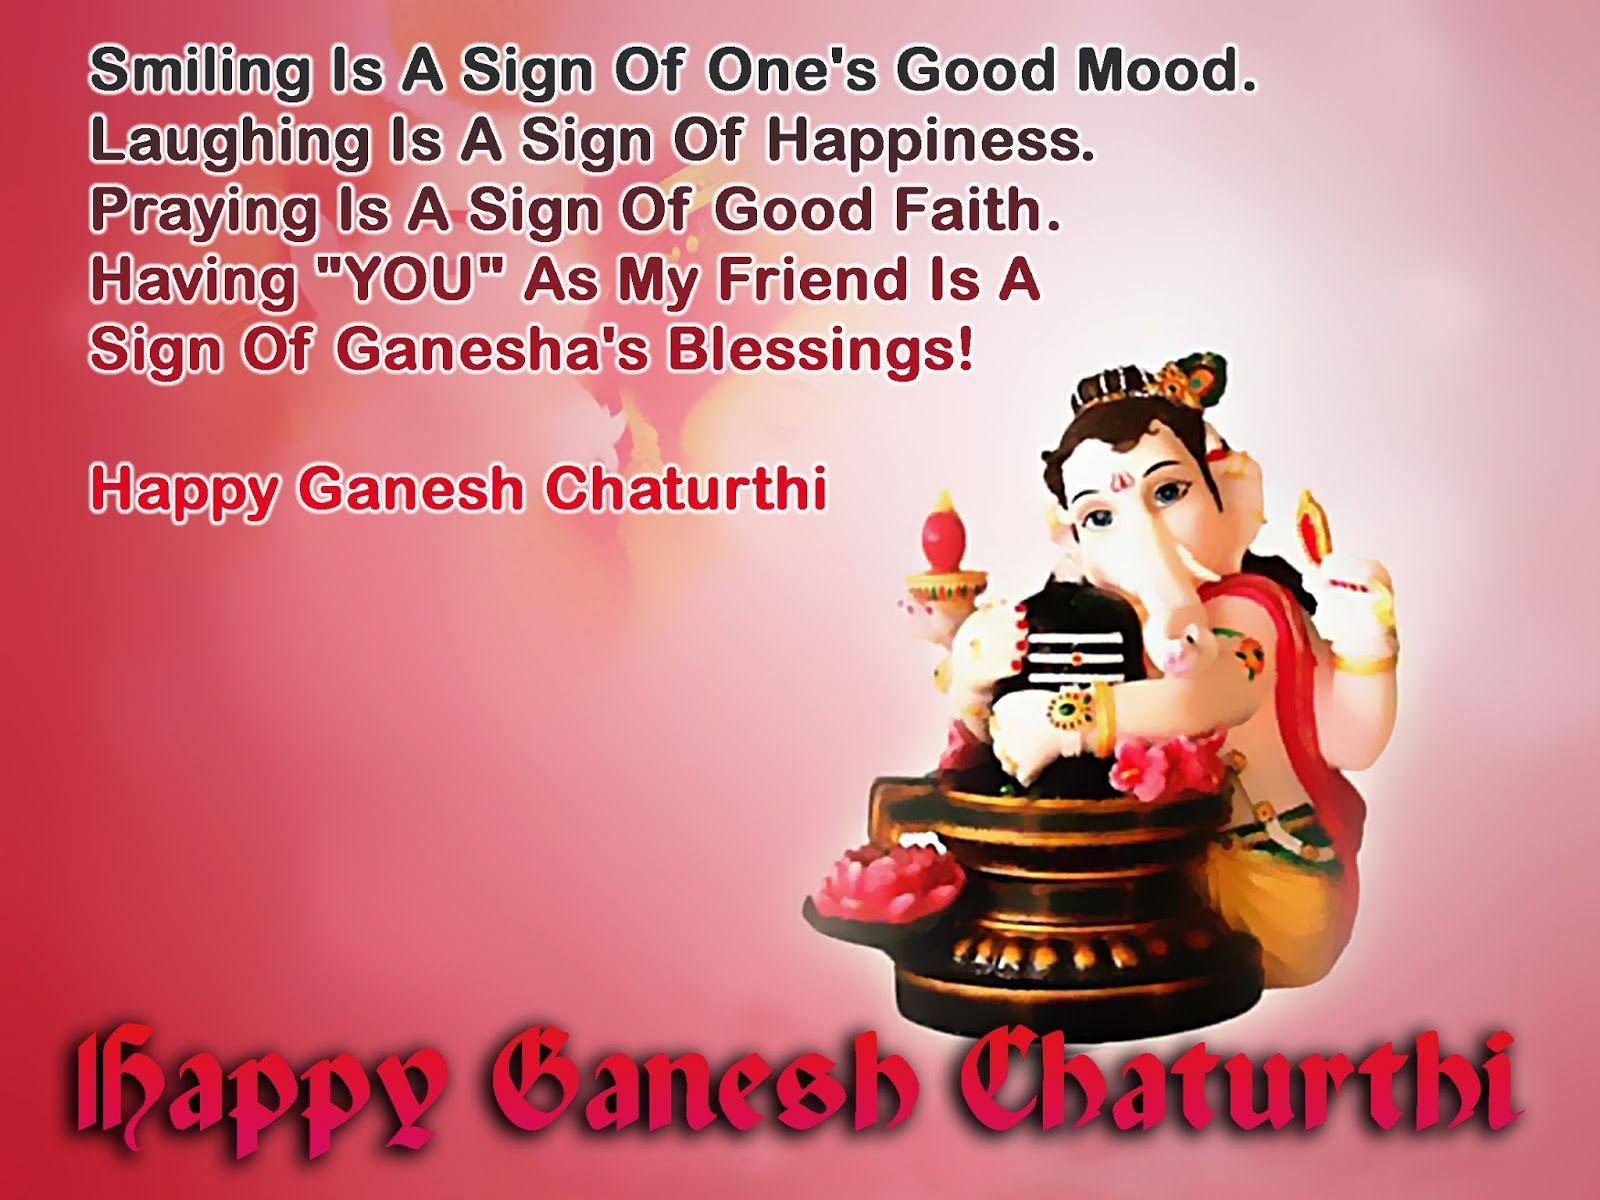 Best 25 Ganesh chaturthi greetings ideas on Pinterest